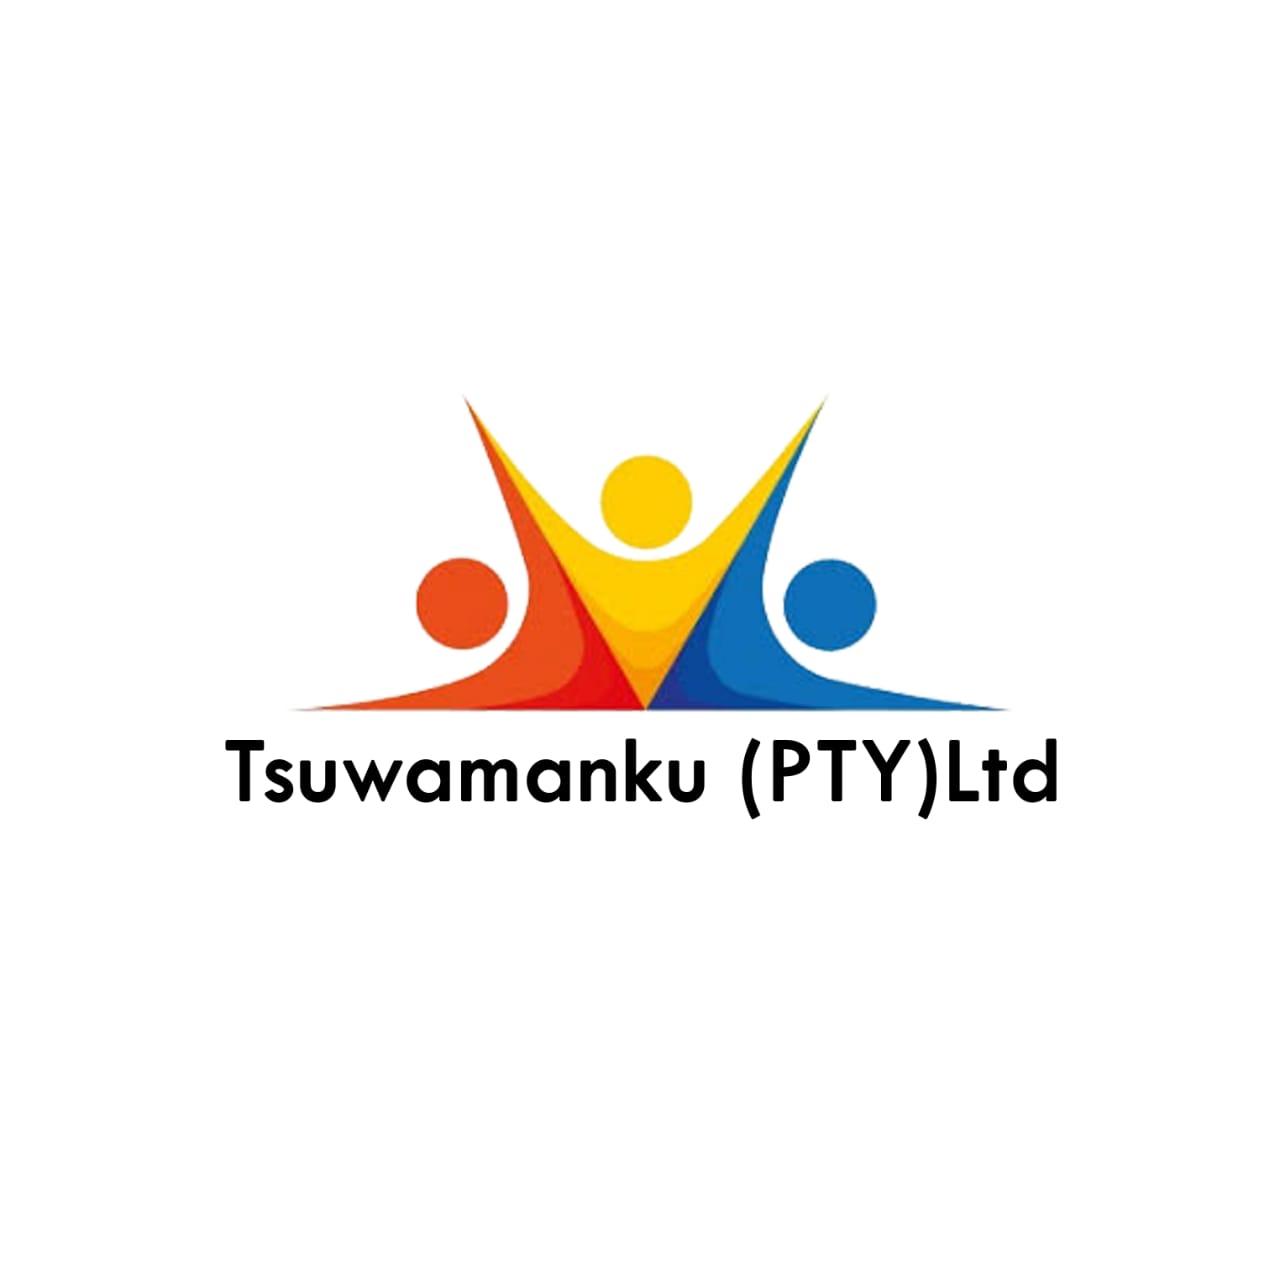 Business Listing for tsuwamanku